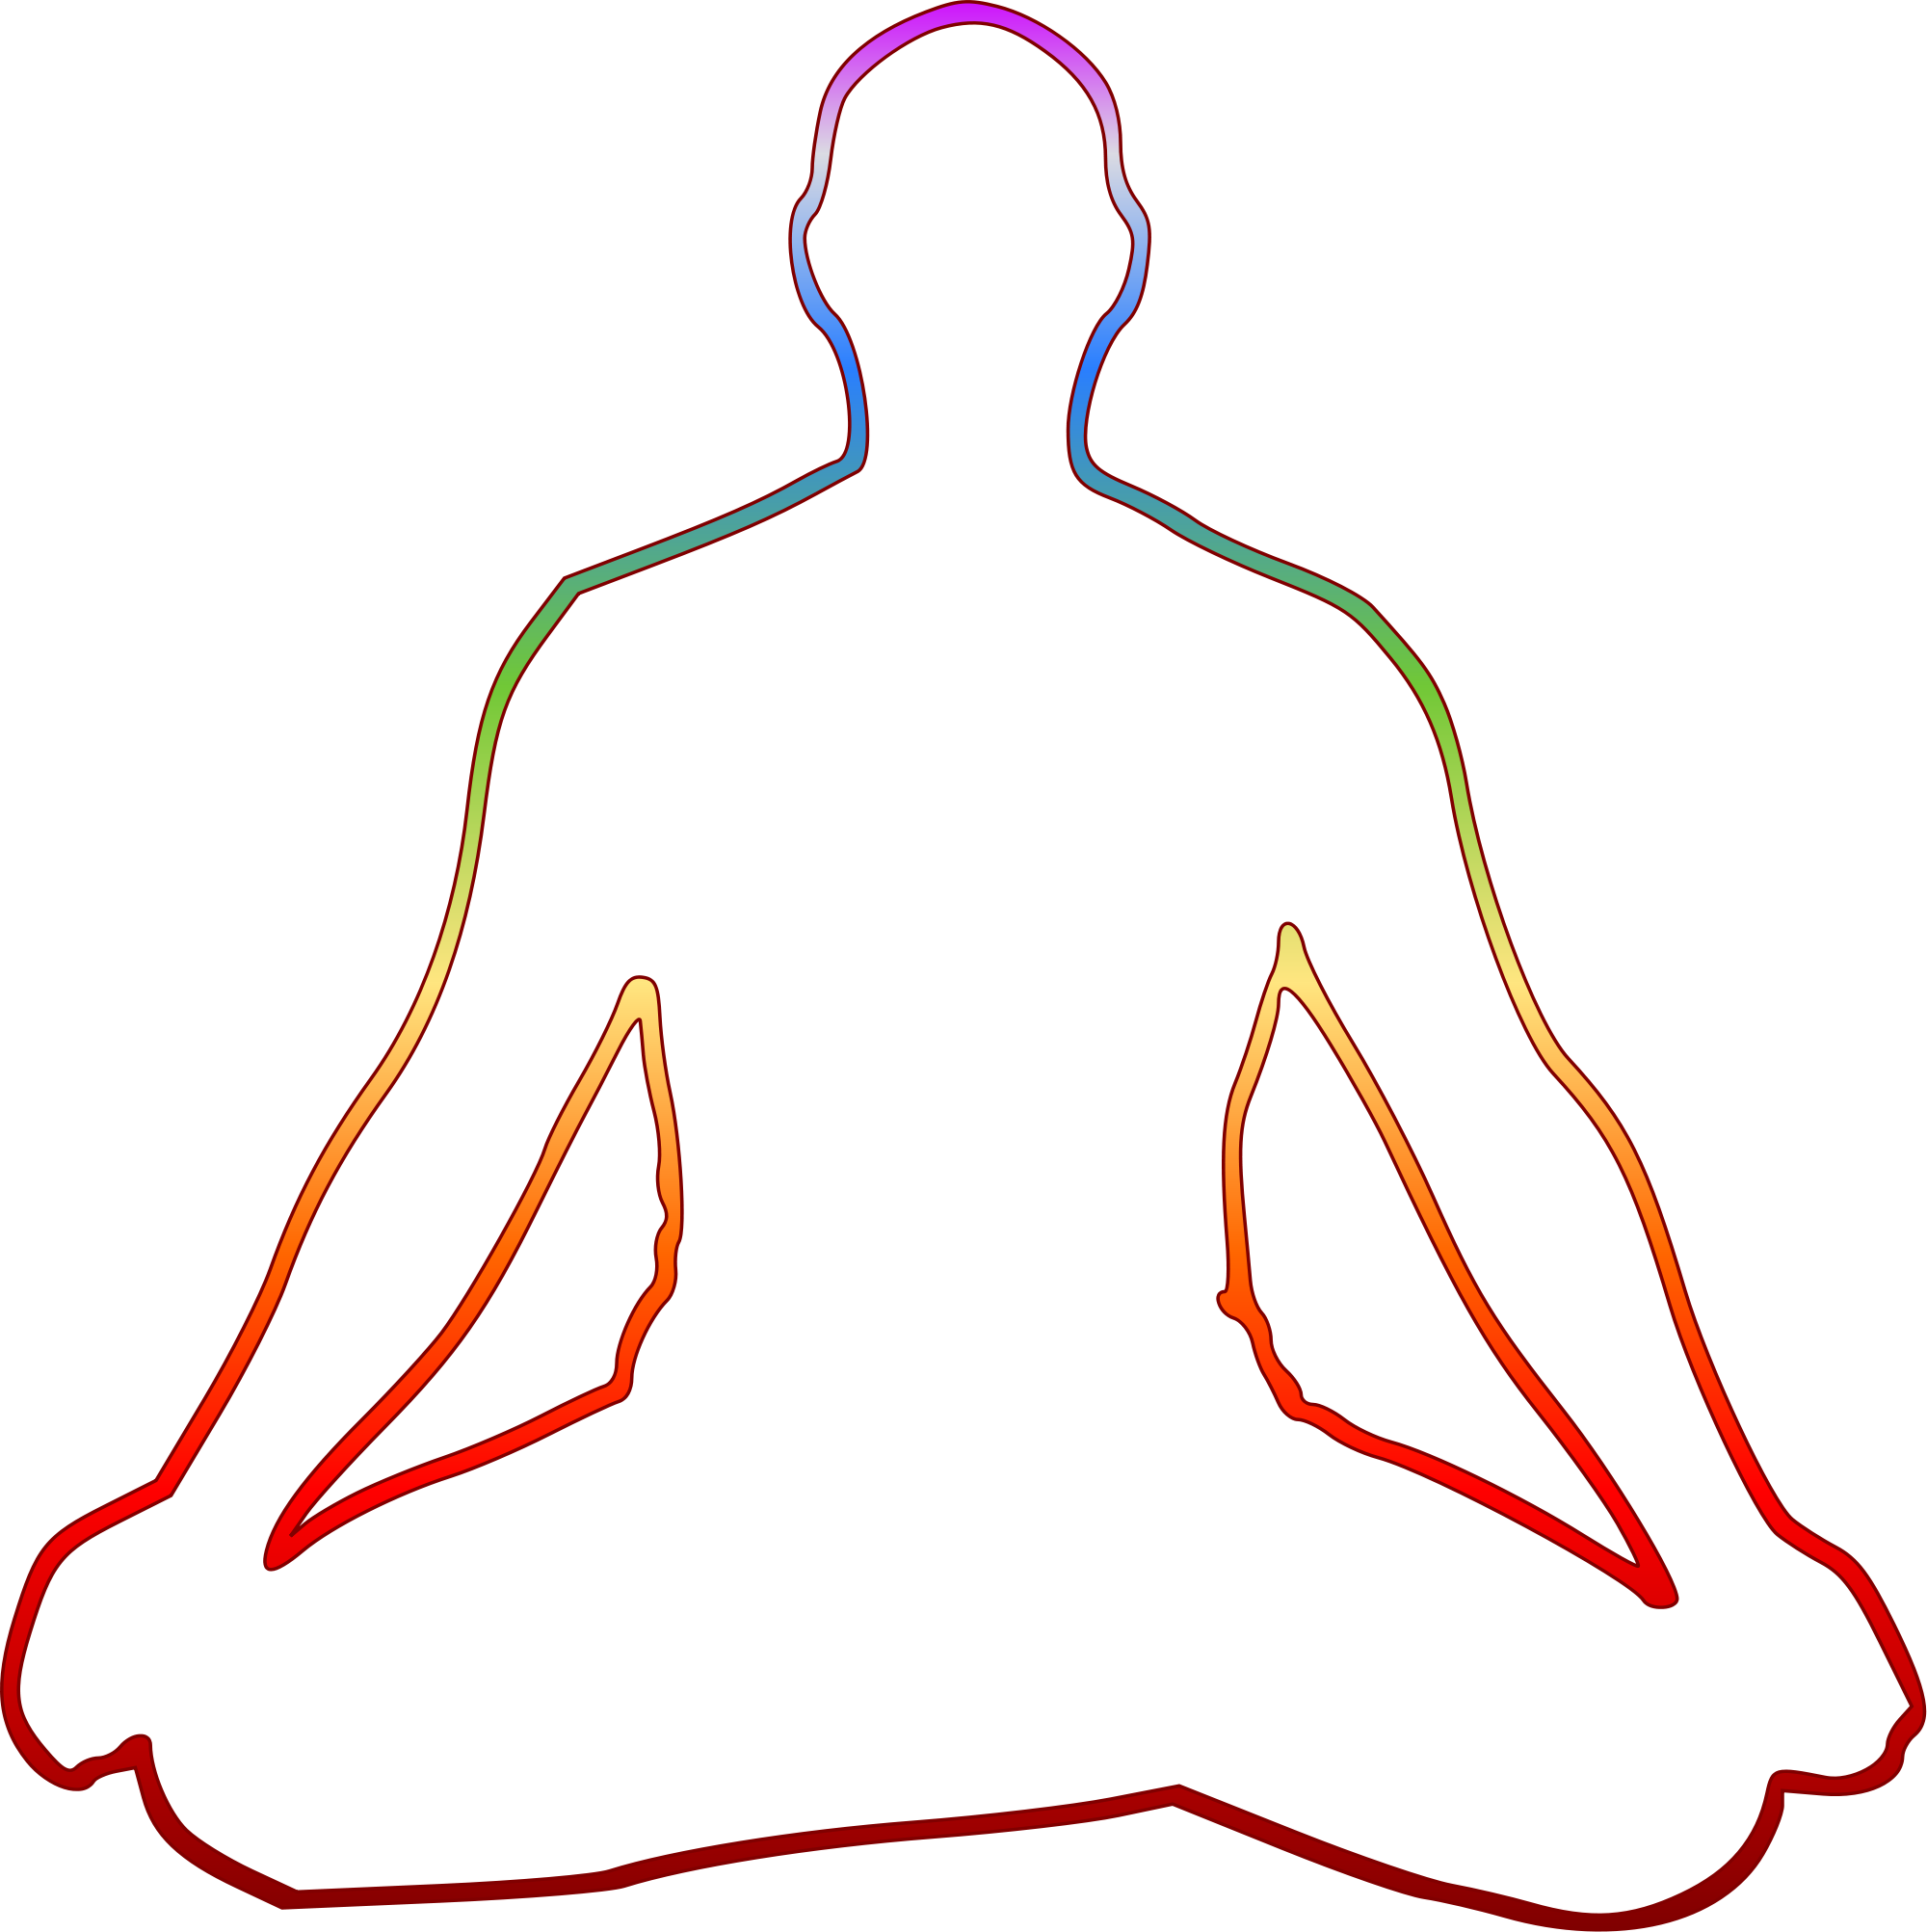 vector black and white download Meditating Drawing at GetDrawings